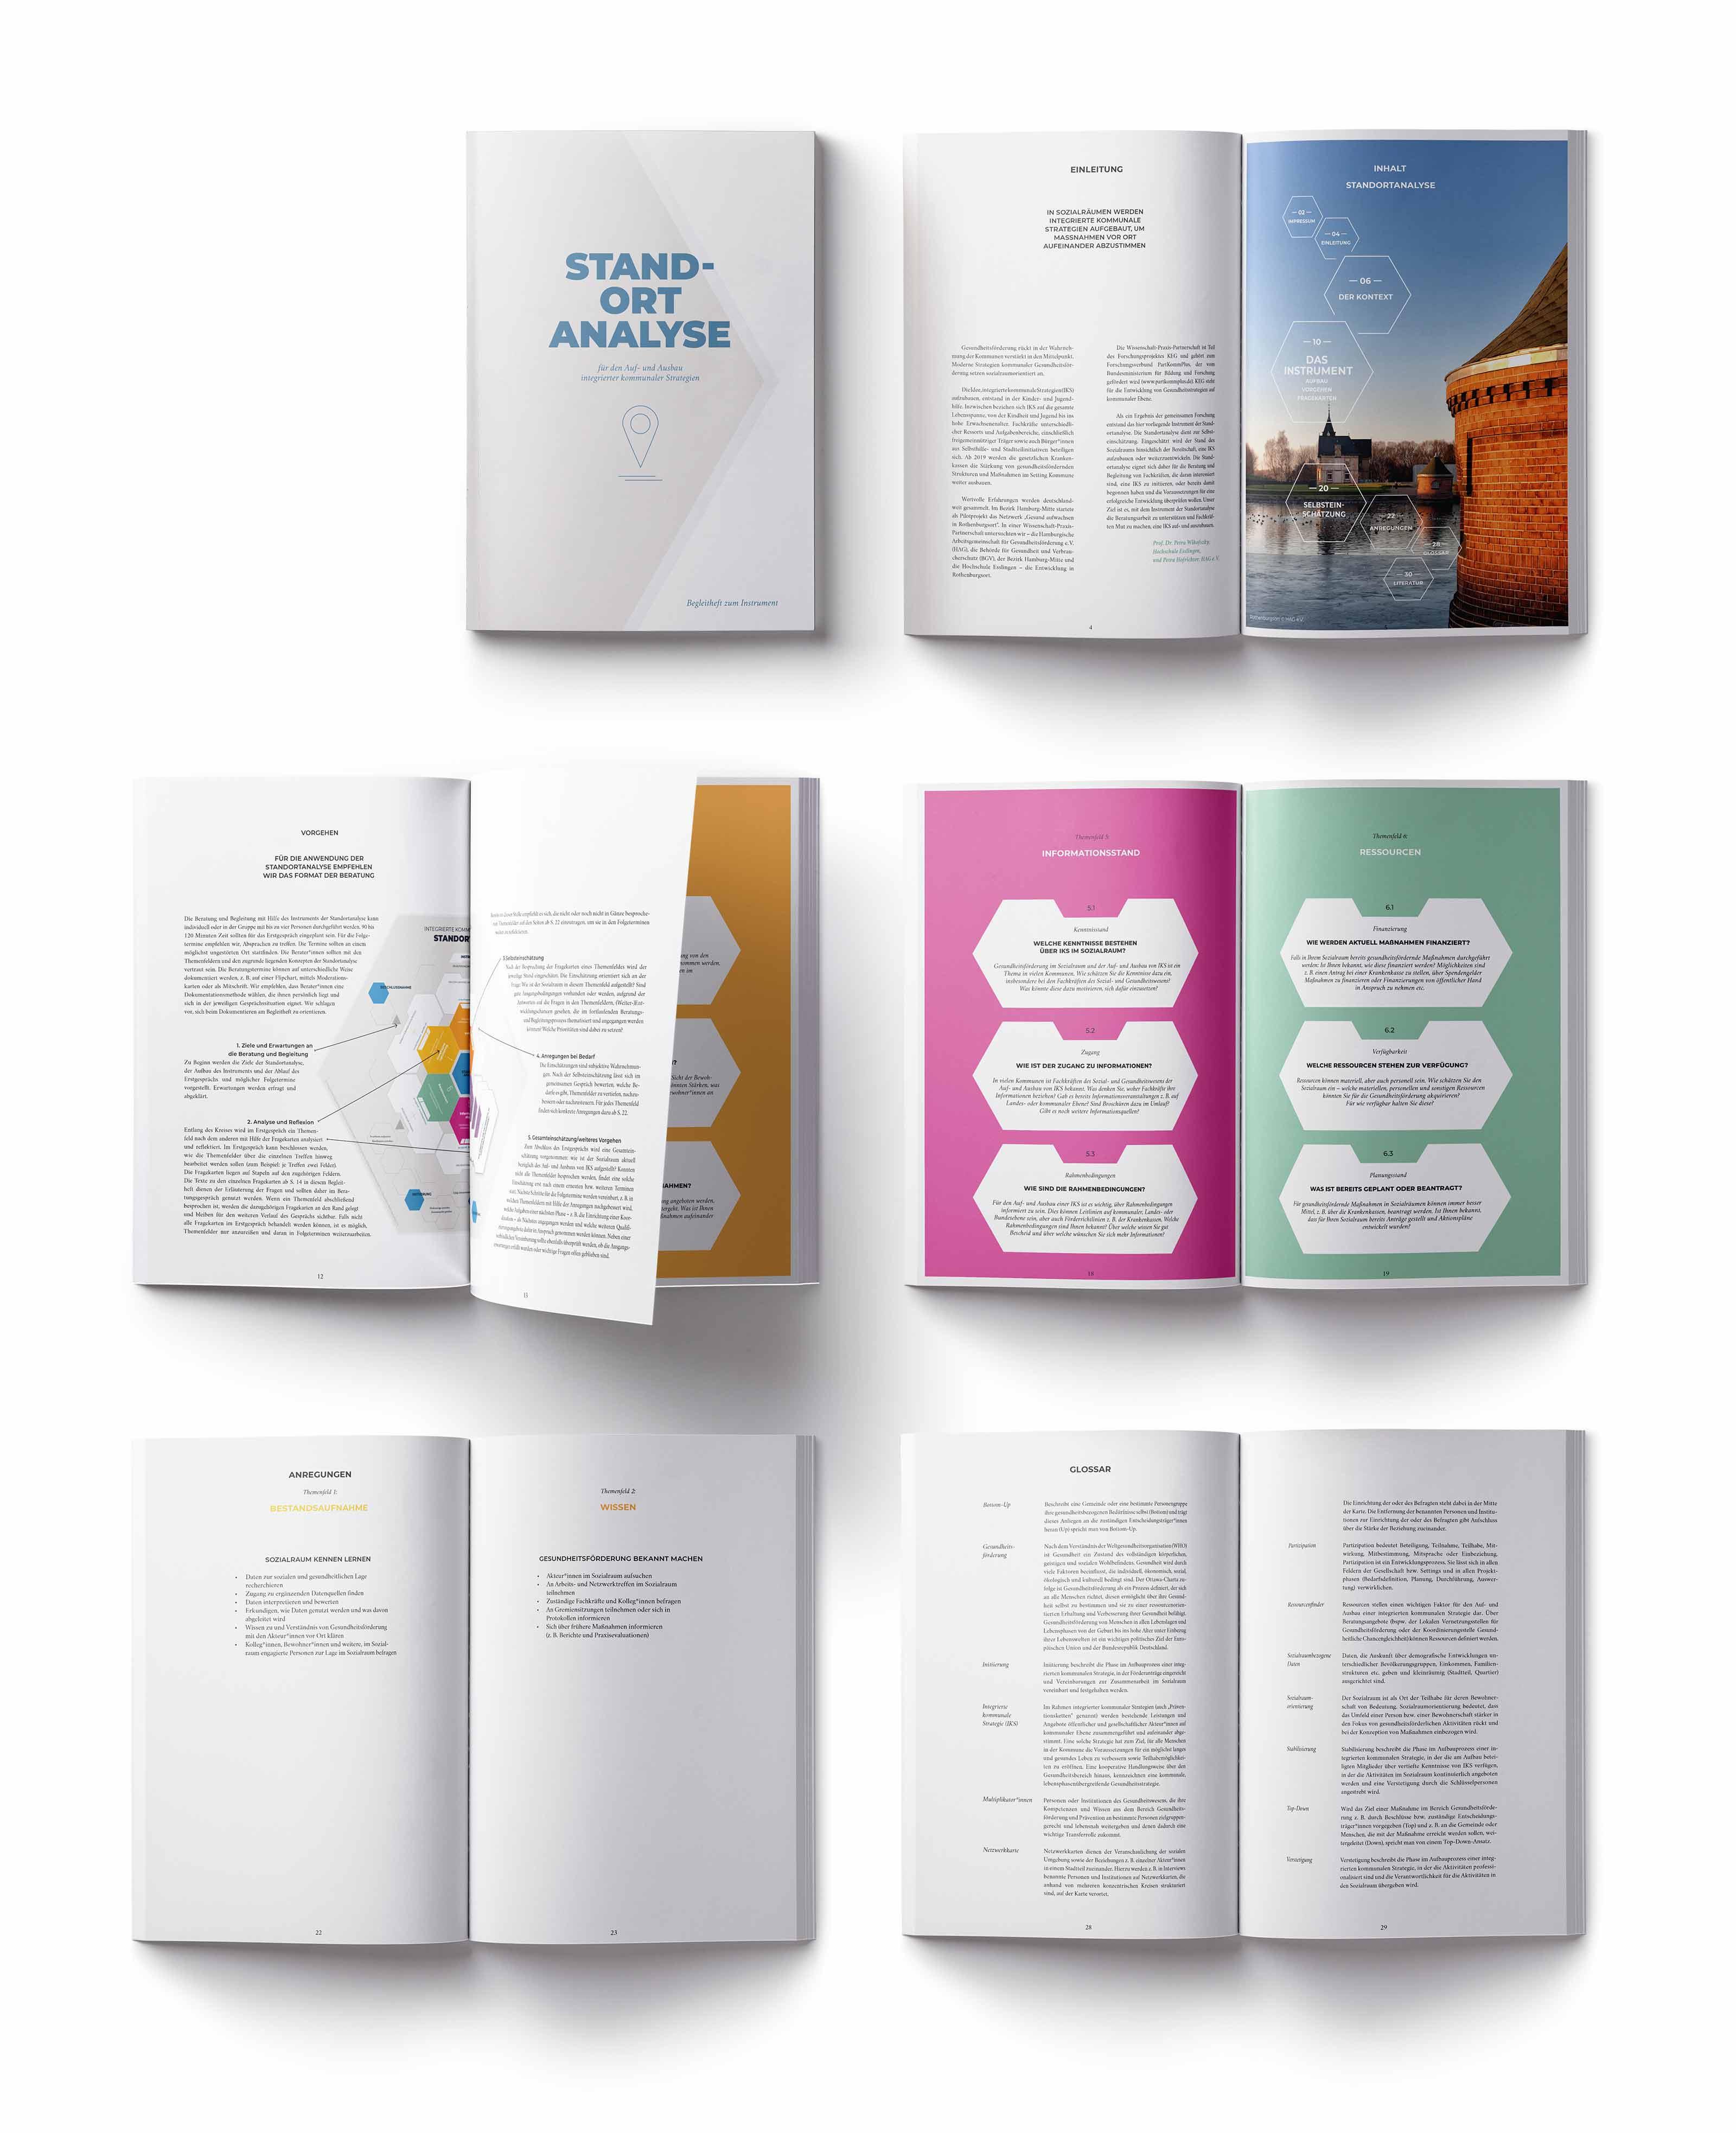 Stadortanalyse Tool Entwicklung, Print Design, Begleitheft